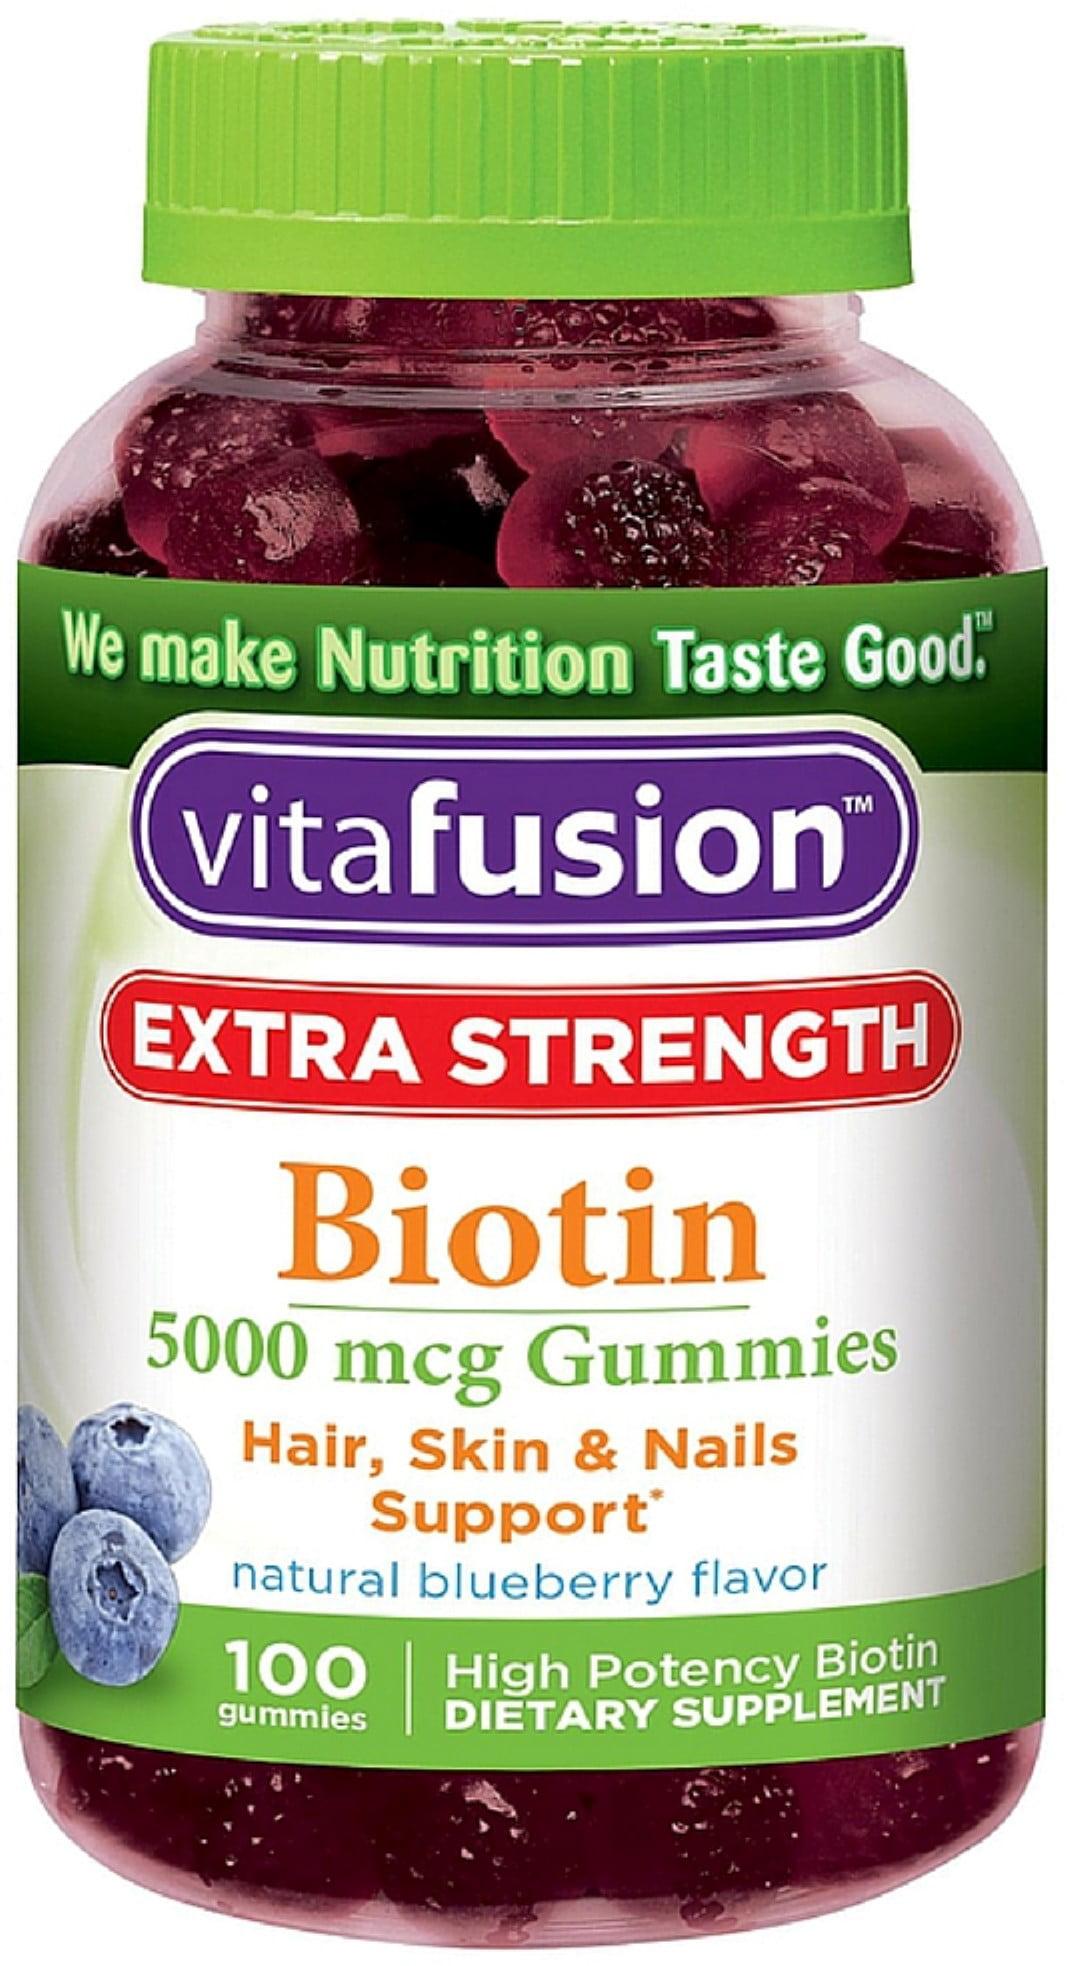 Vitafusion Extra Strength Biotin Gummies, Blueberry, 12 mcg, 12 Ct    Walmart.com